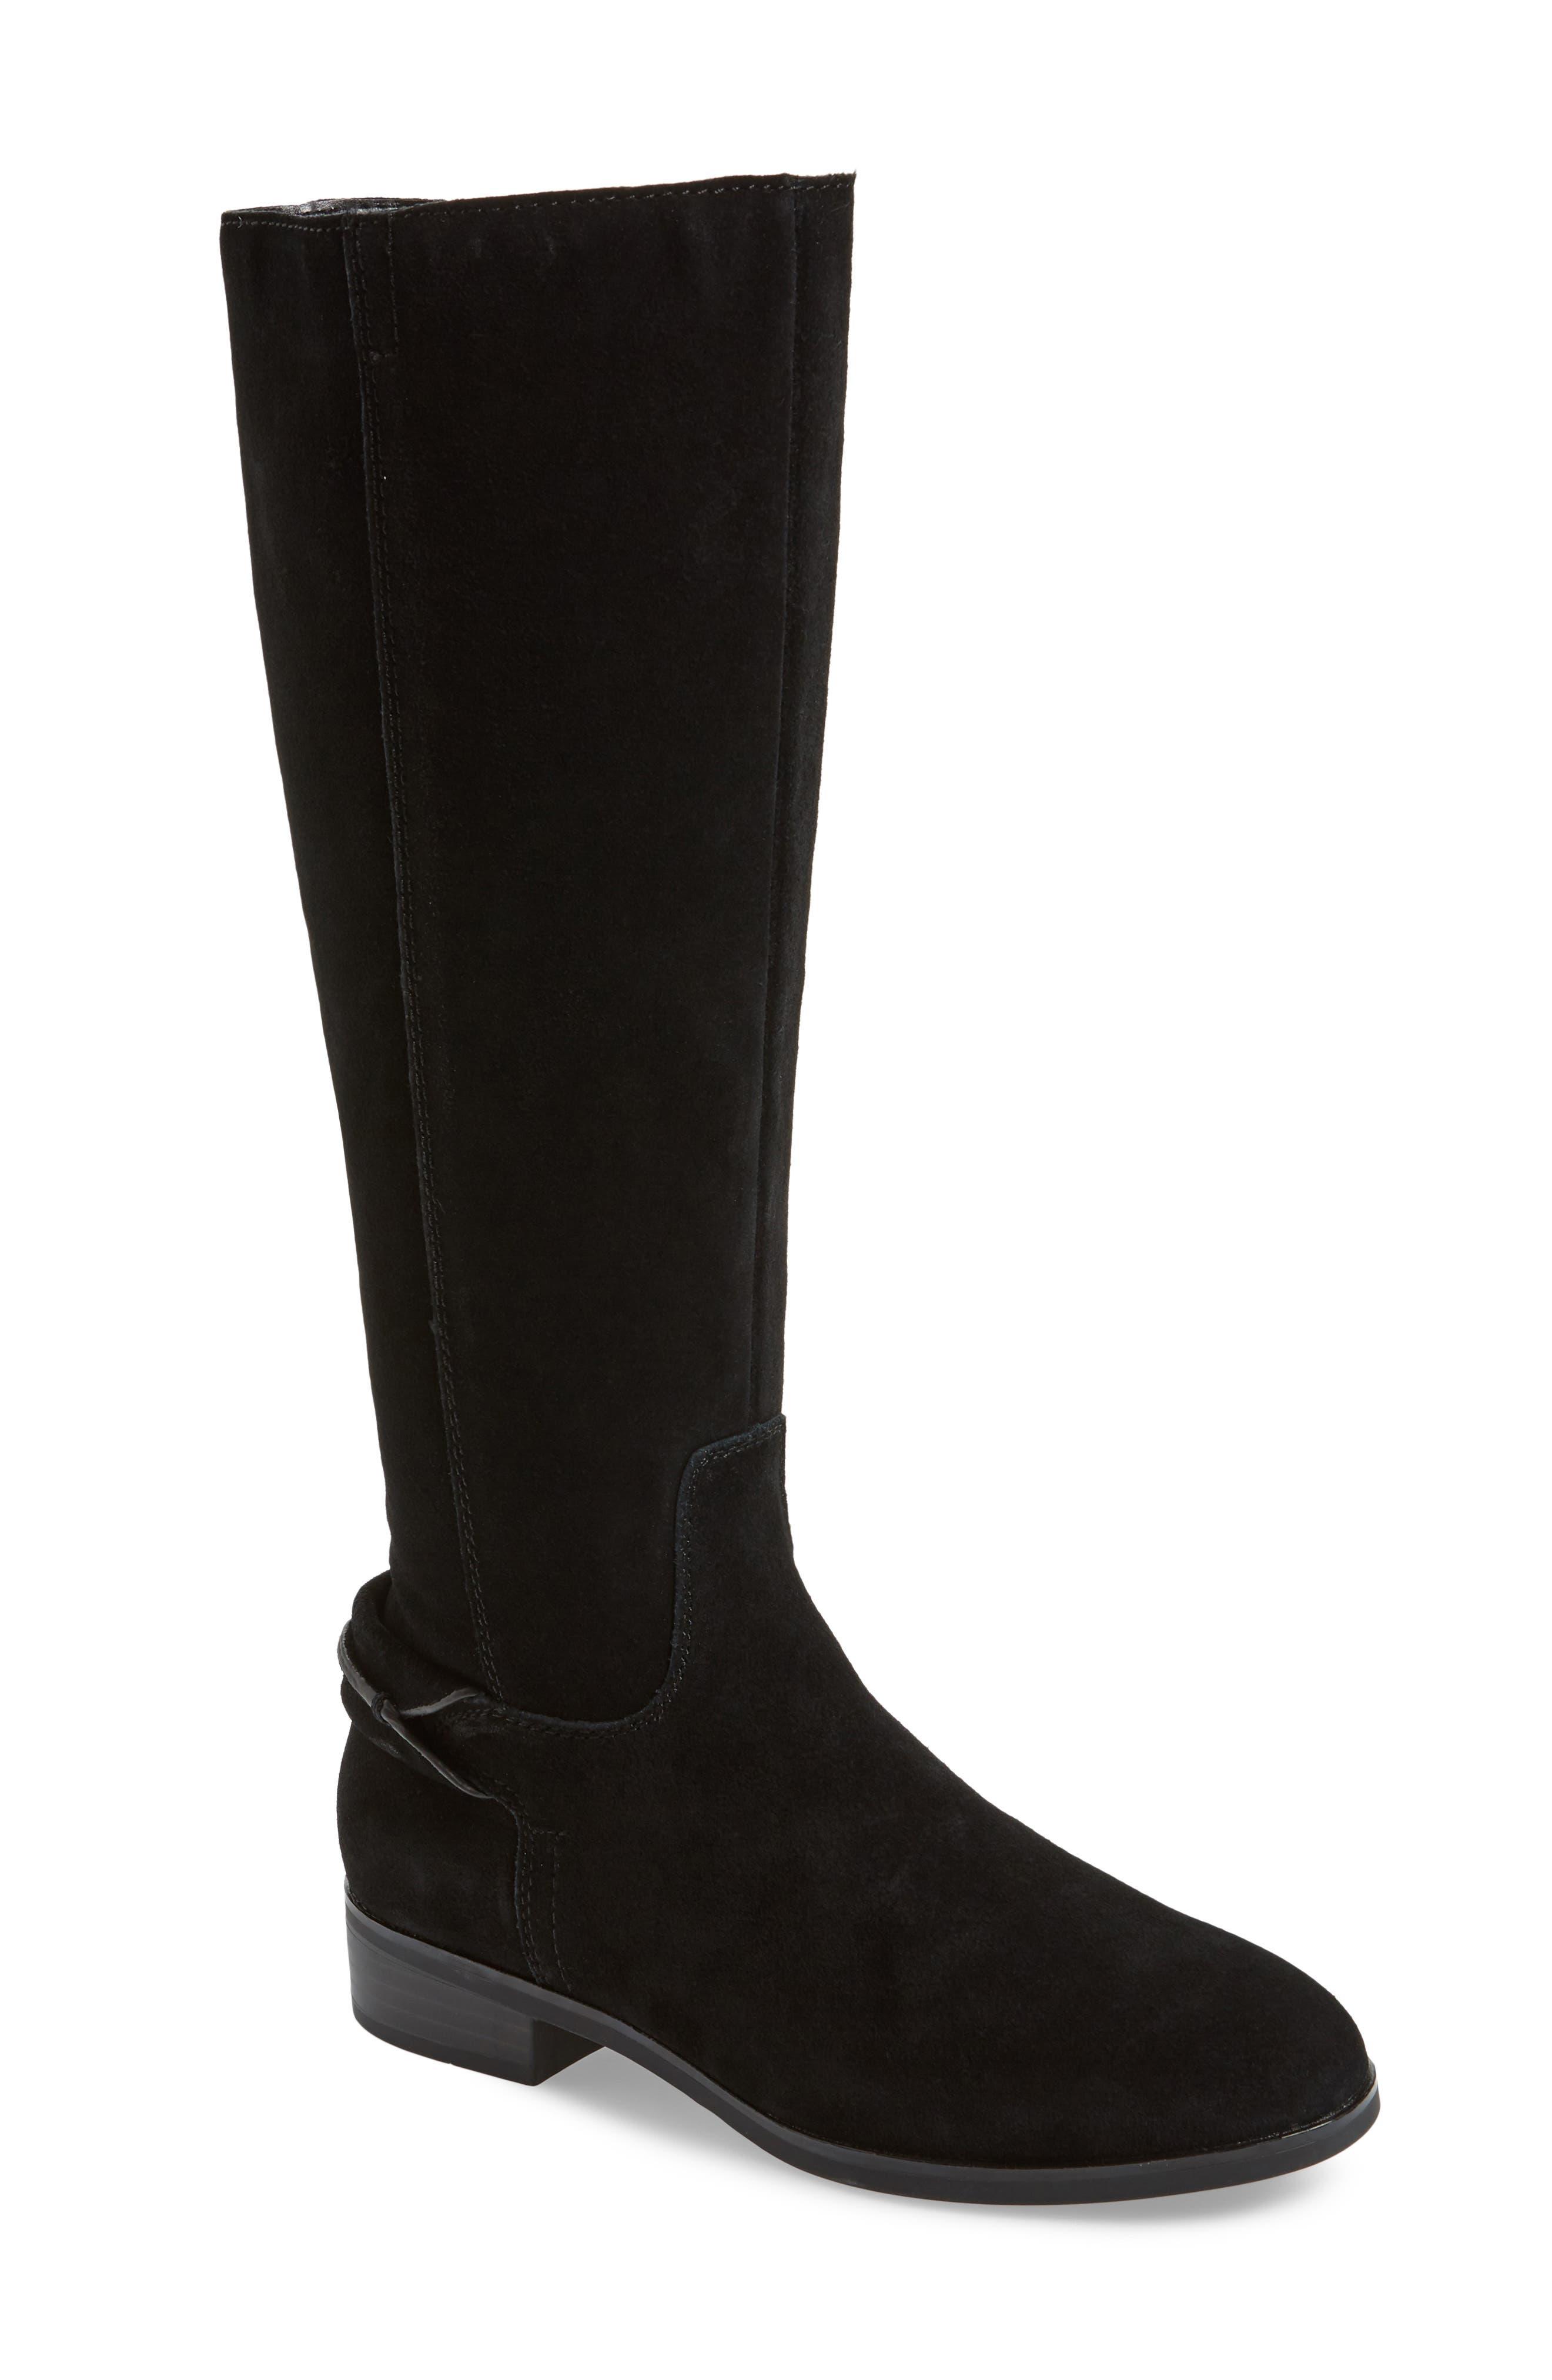 KENSIE Cheverly Knee High Boot in Black Suede